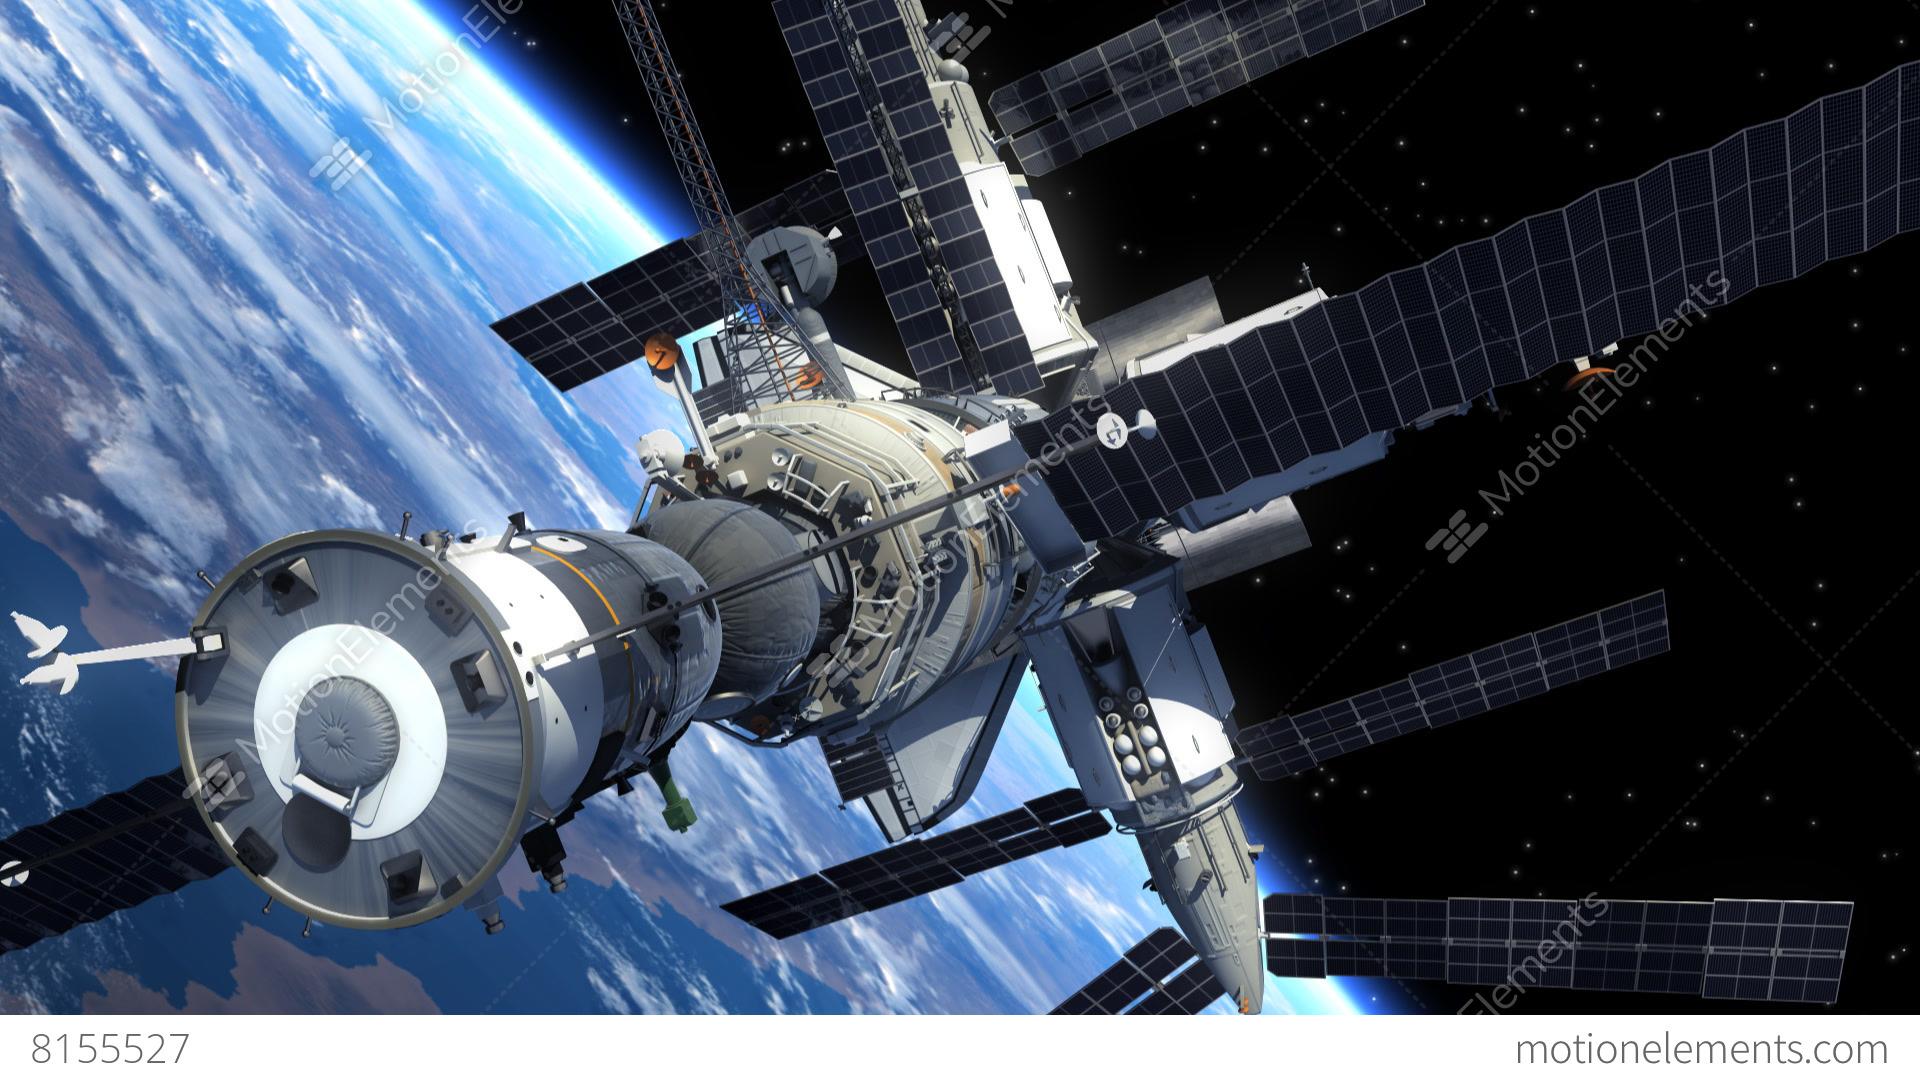 astronaut orbiting space station - photo #15